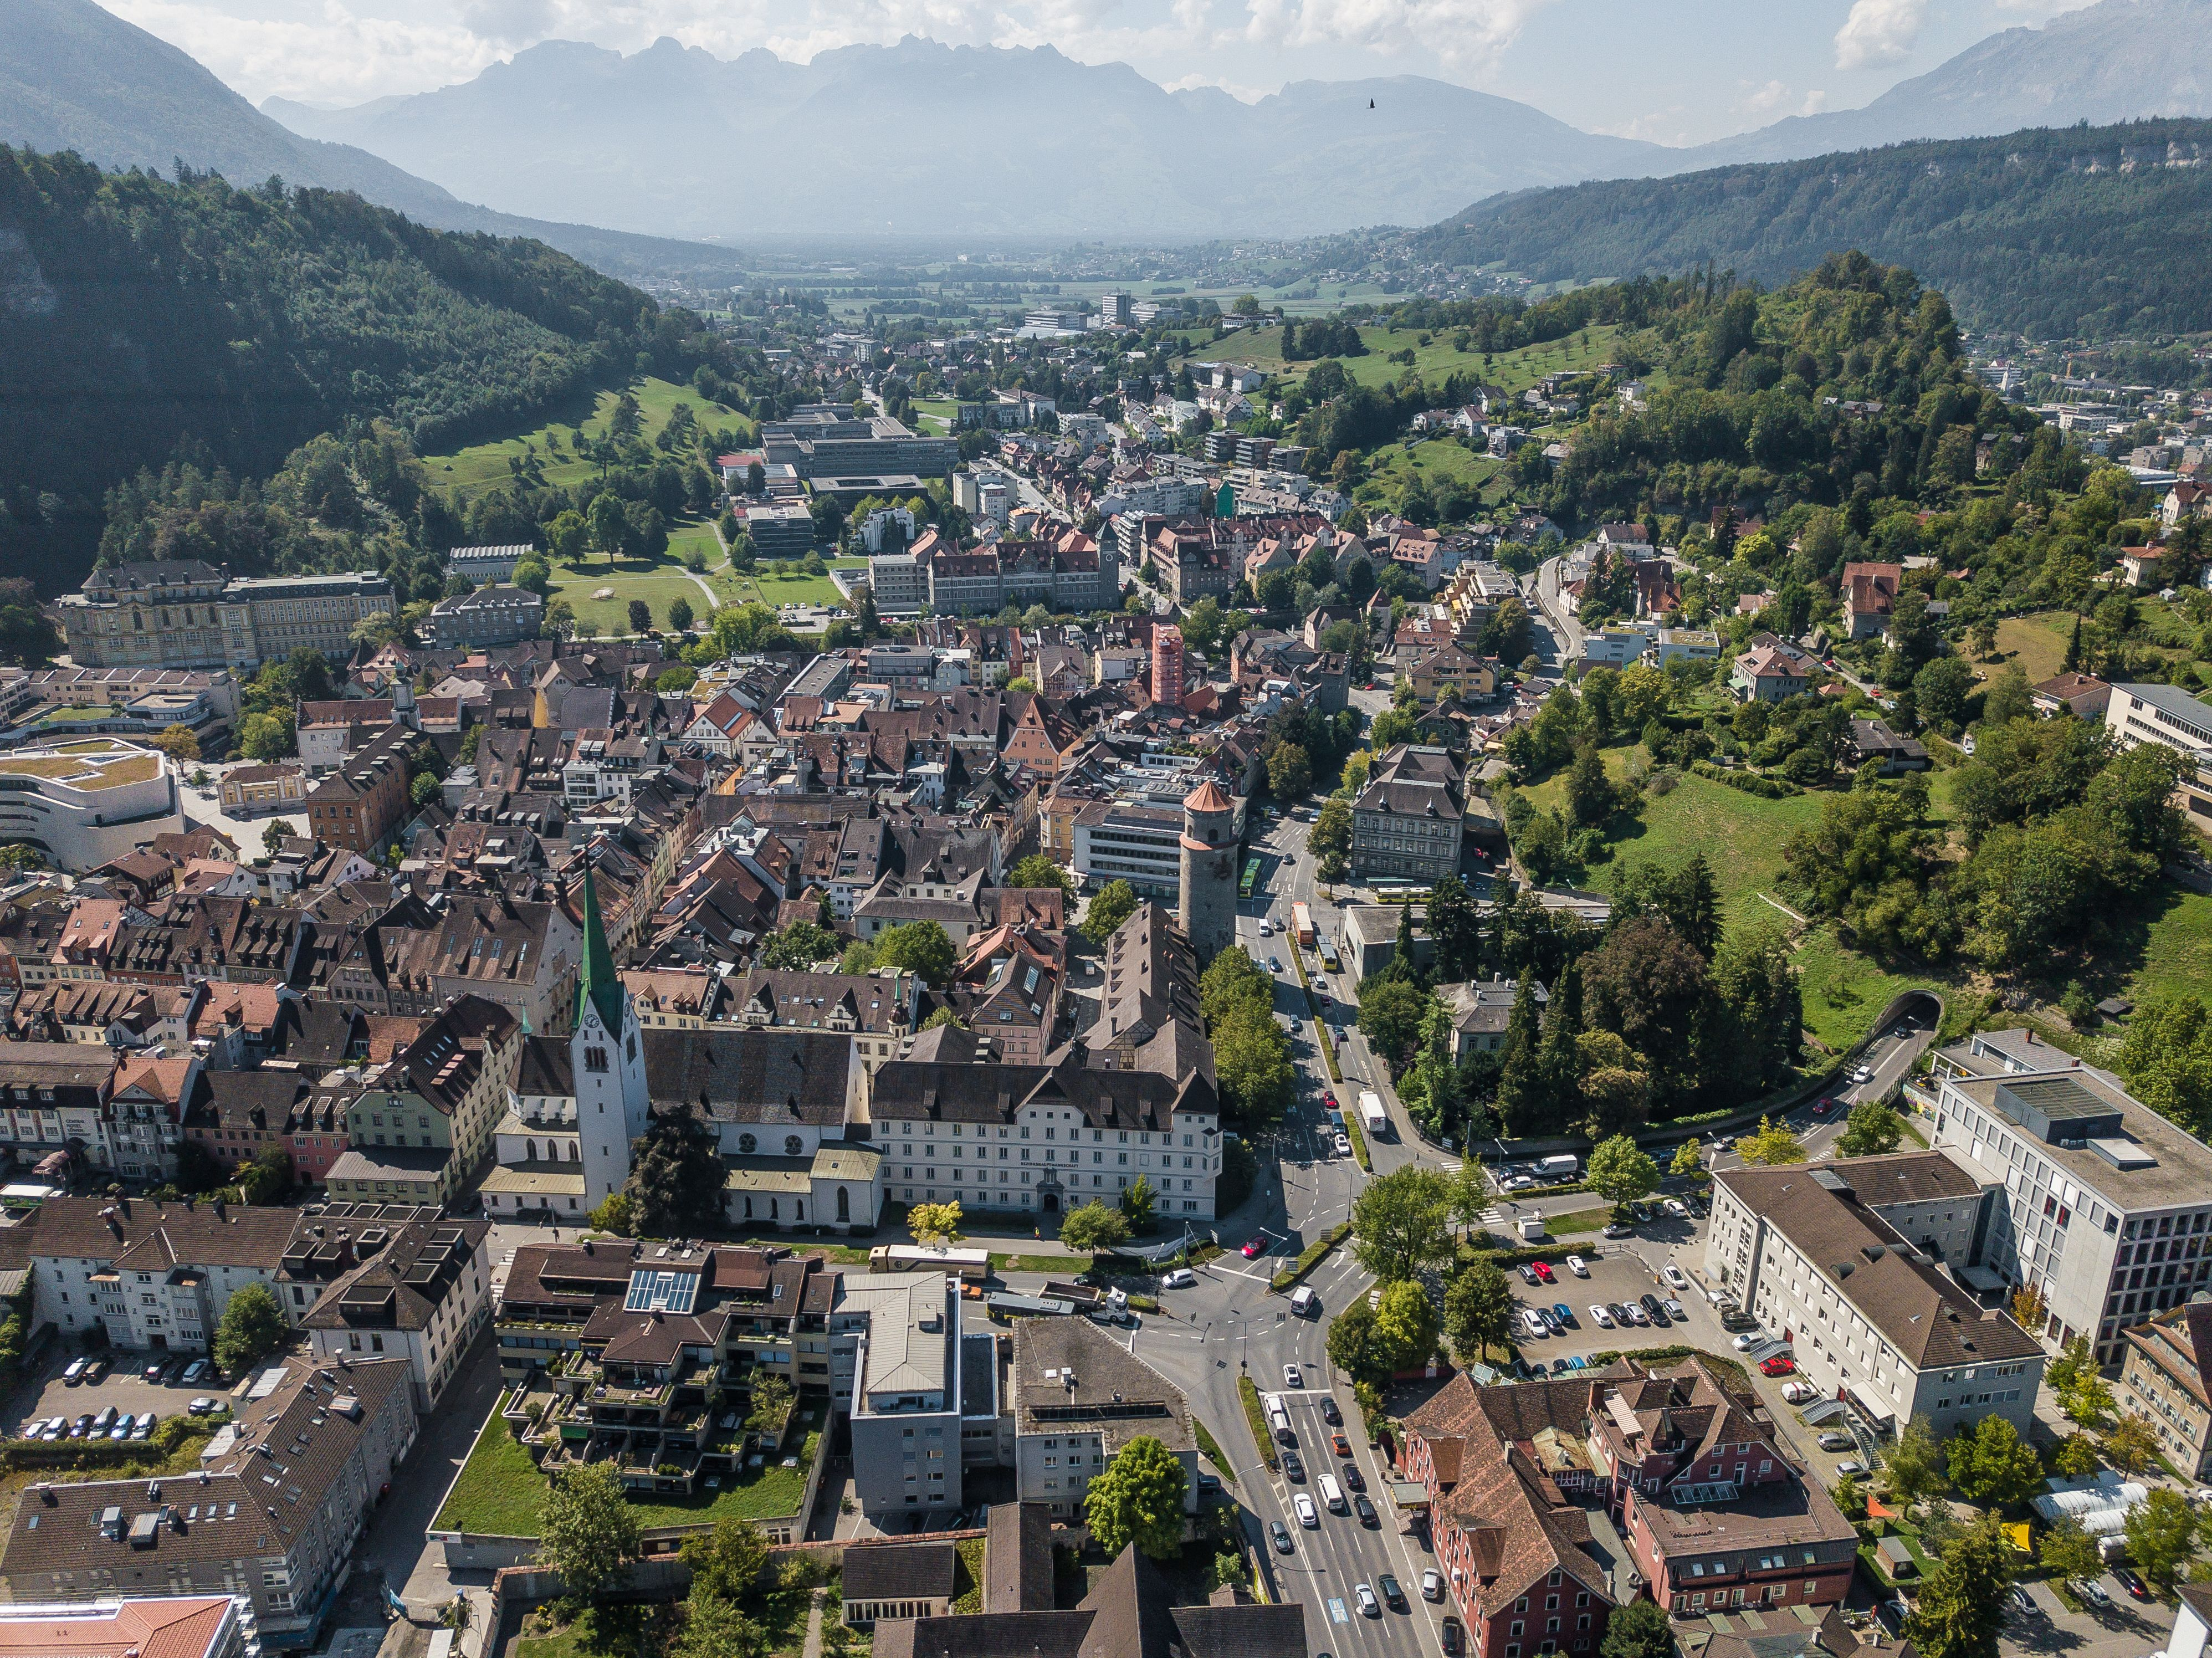 Stadt Feldkirch benennt Gasse nach Arthur Conan Doyle